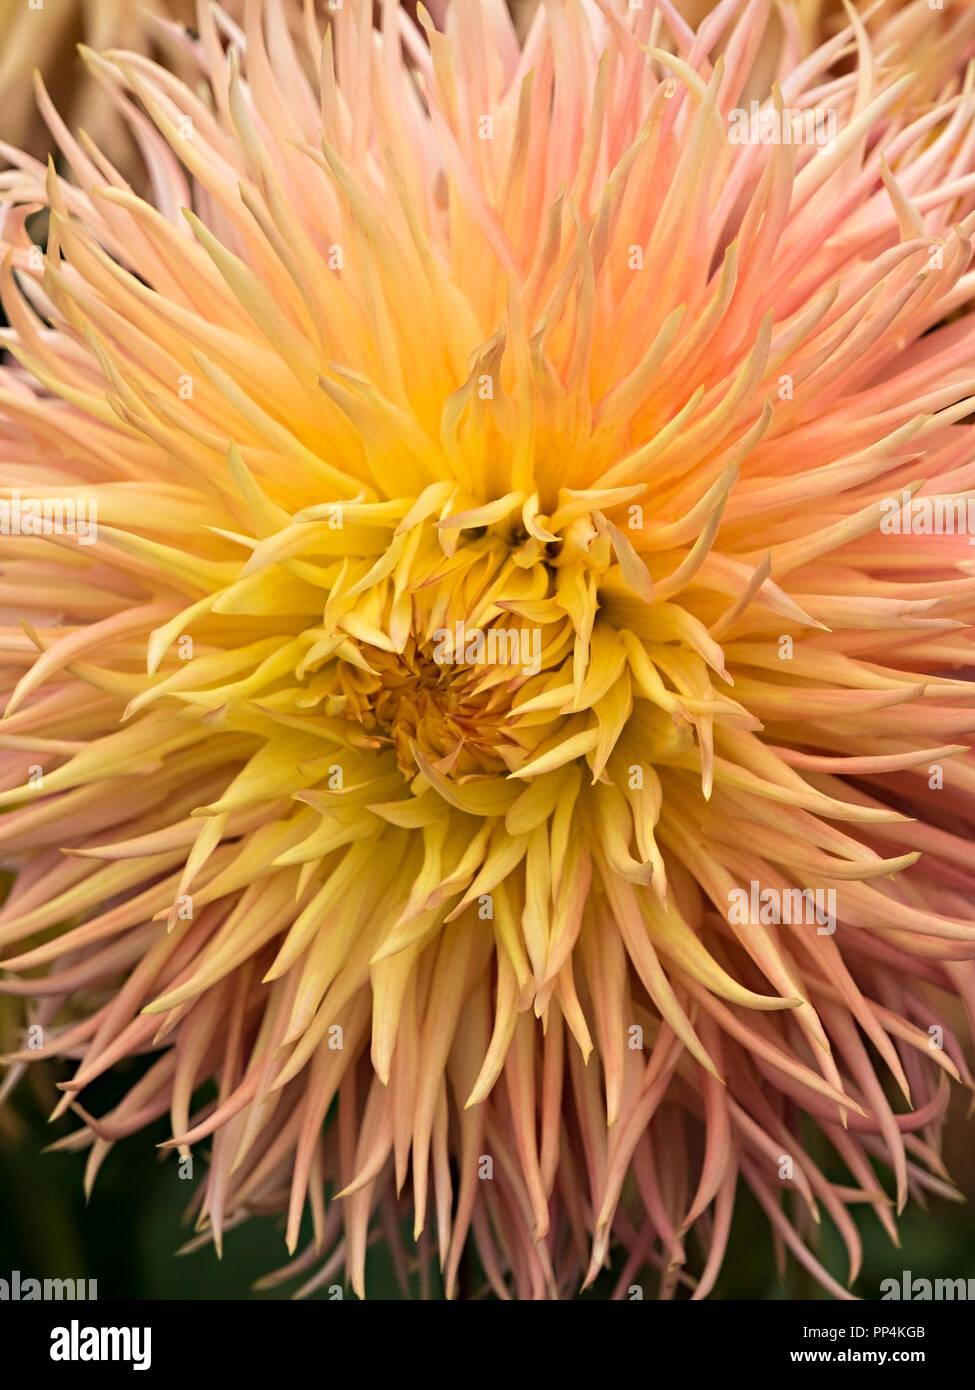 'Normandie Frills' Dahlia flower closeup, Derbyshire, England, UK - Stock Image